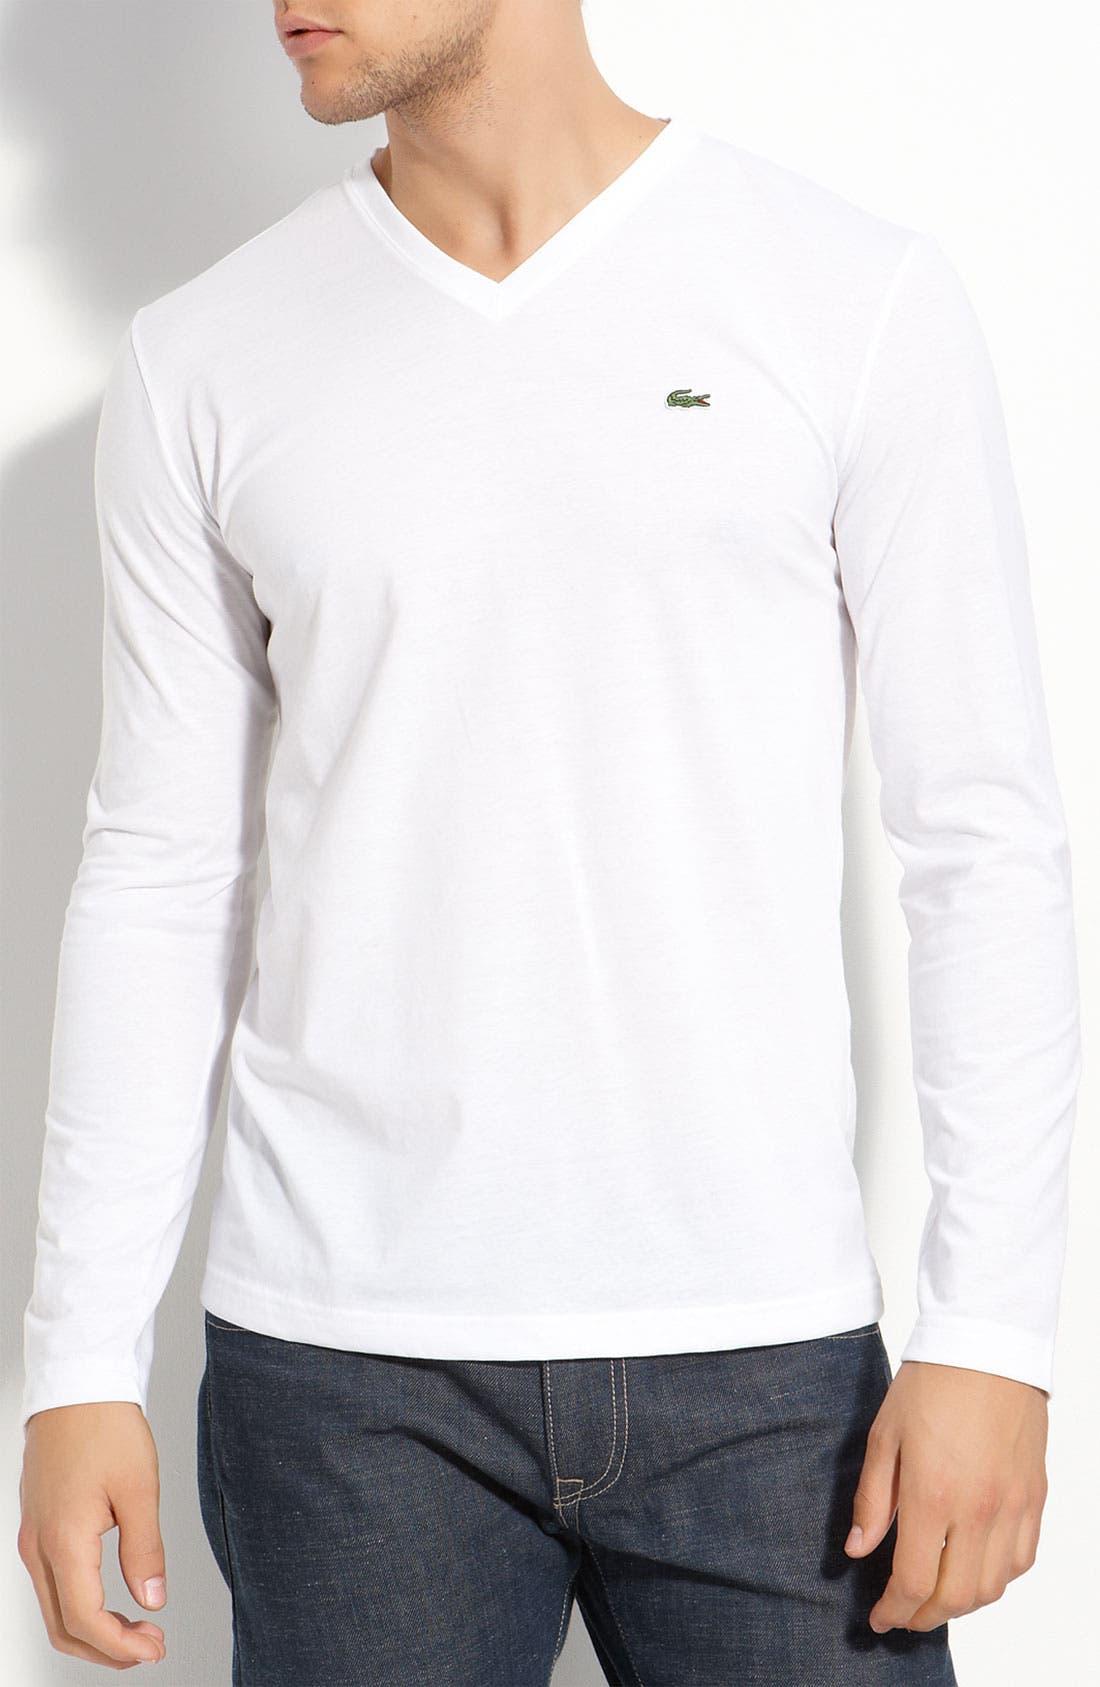 Alternate Image 1 Selected - Lacoste Pima Cotton V-Neck T-Shirt